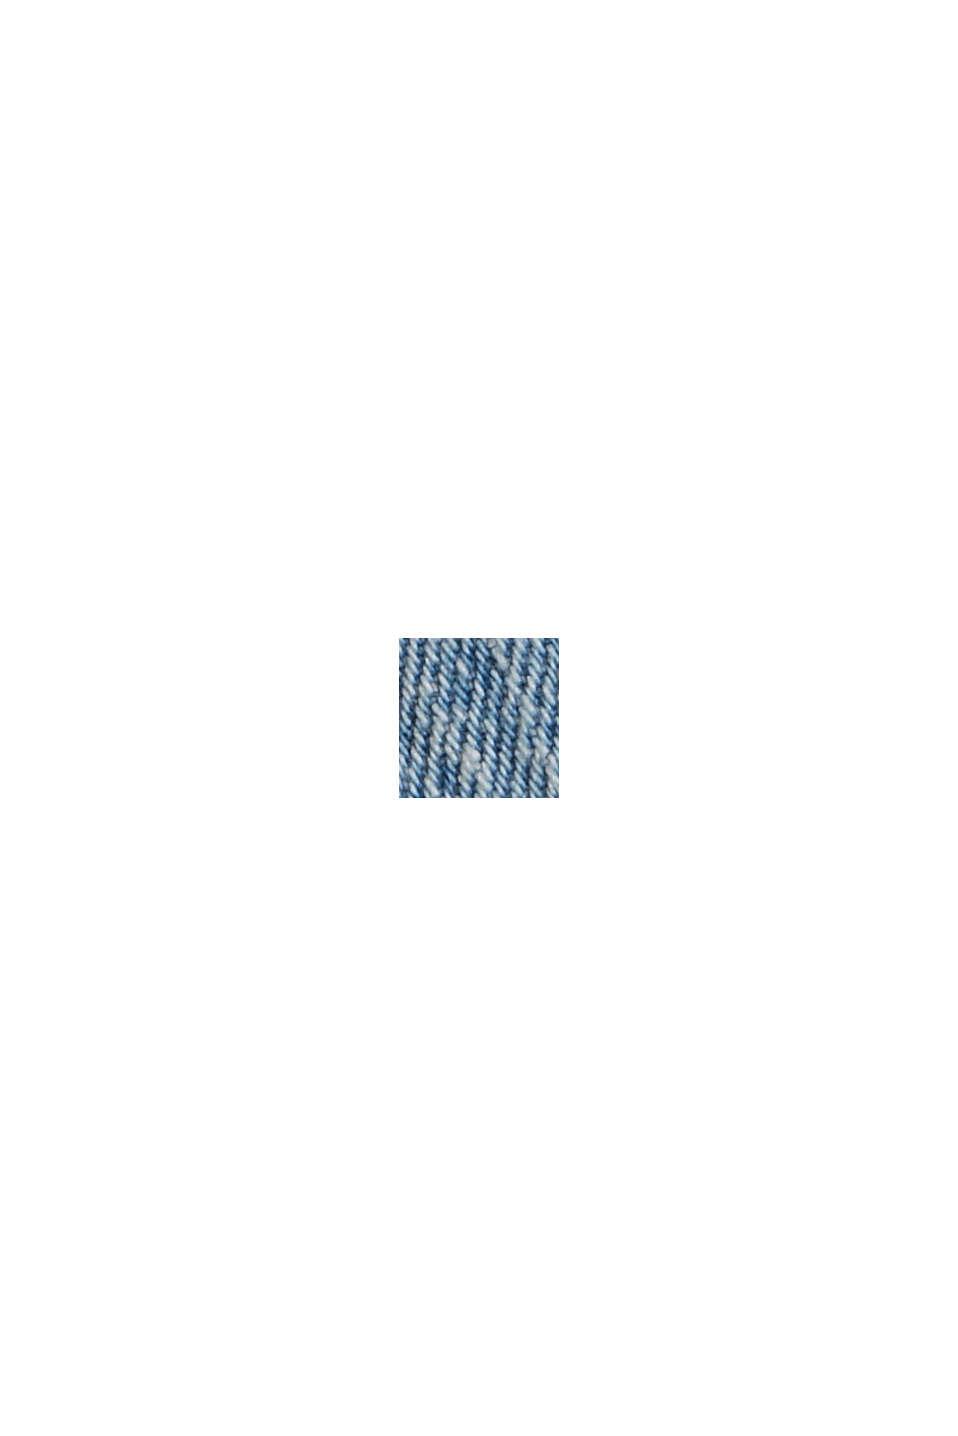 Denim overshirt made of organic cotton, BLUE LIGHT WASHED, swatch